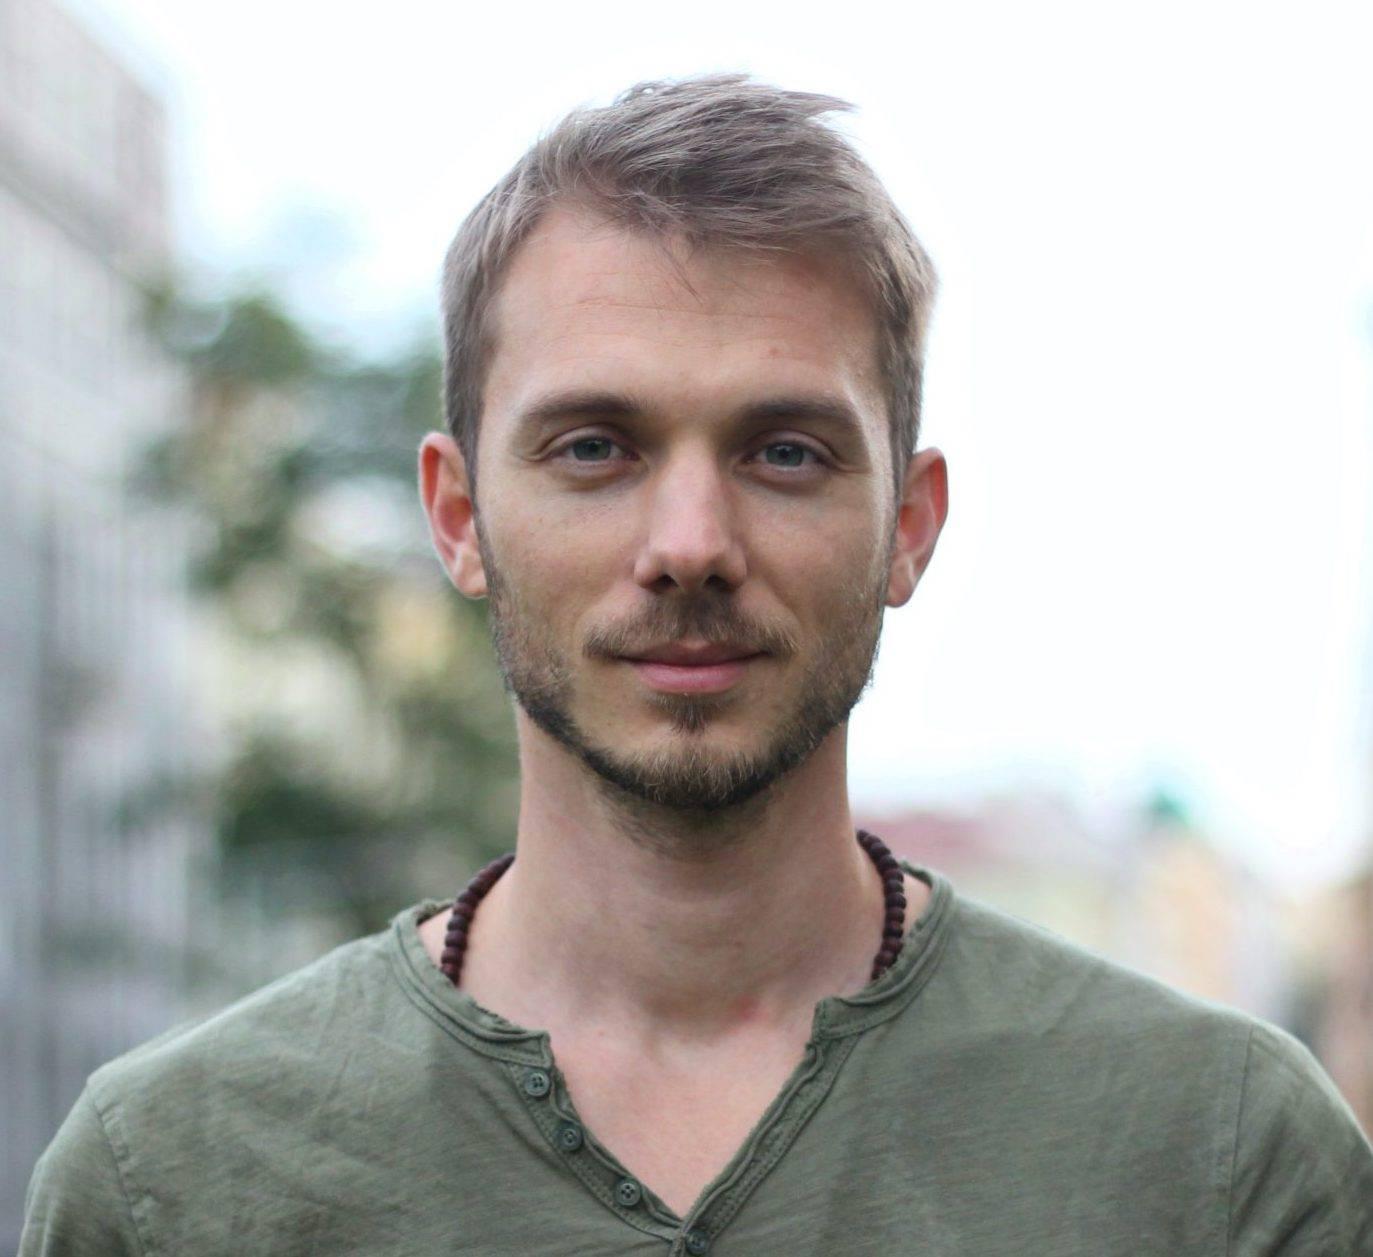 Marek-Vich-profil-2020-10-2-zizkov-5-final-scaled